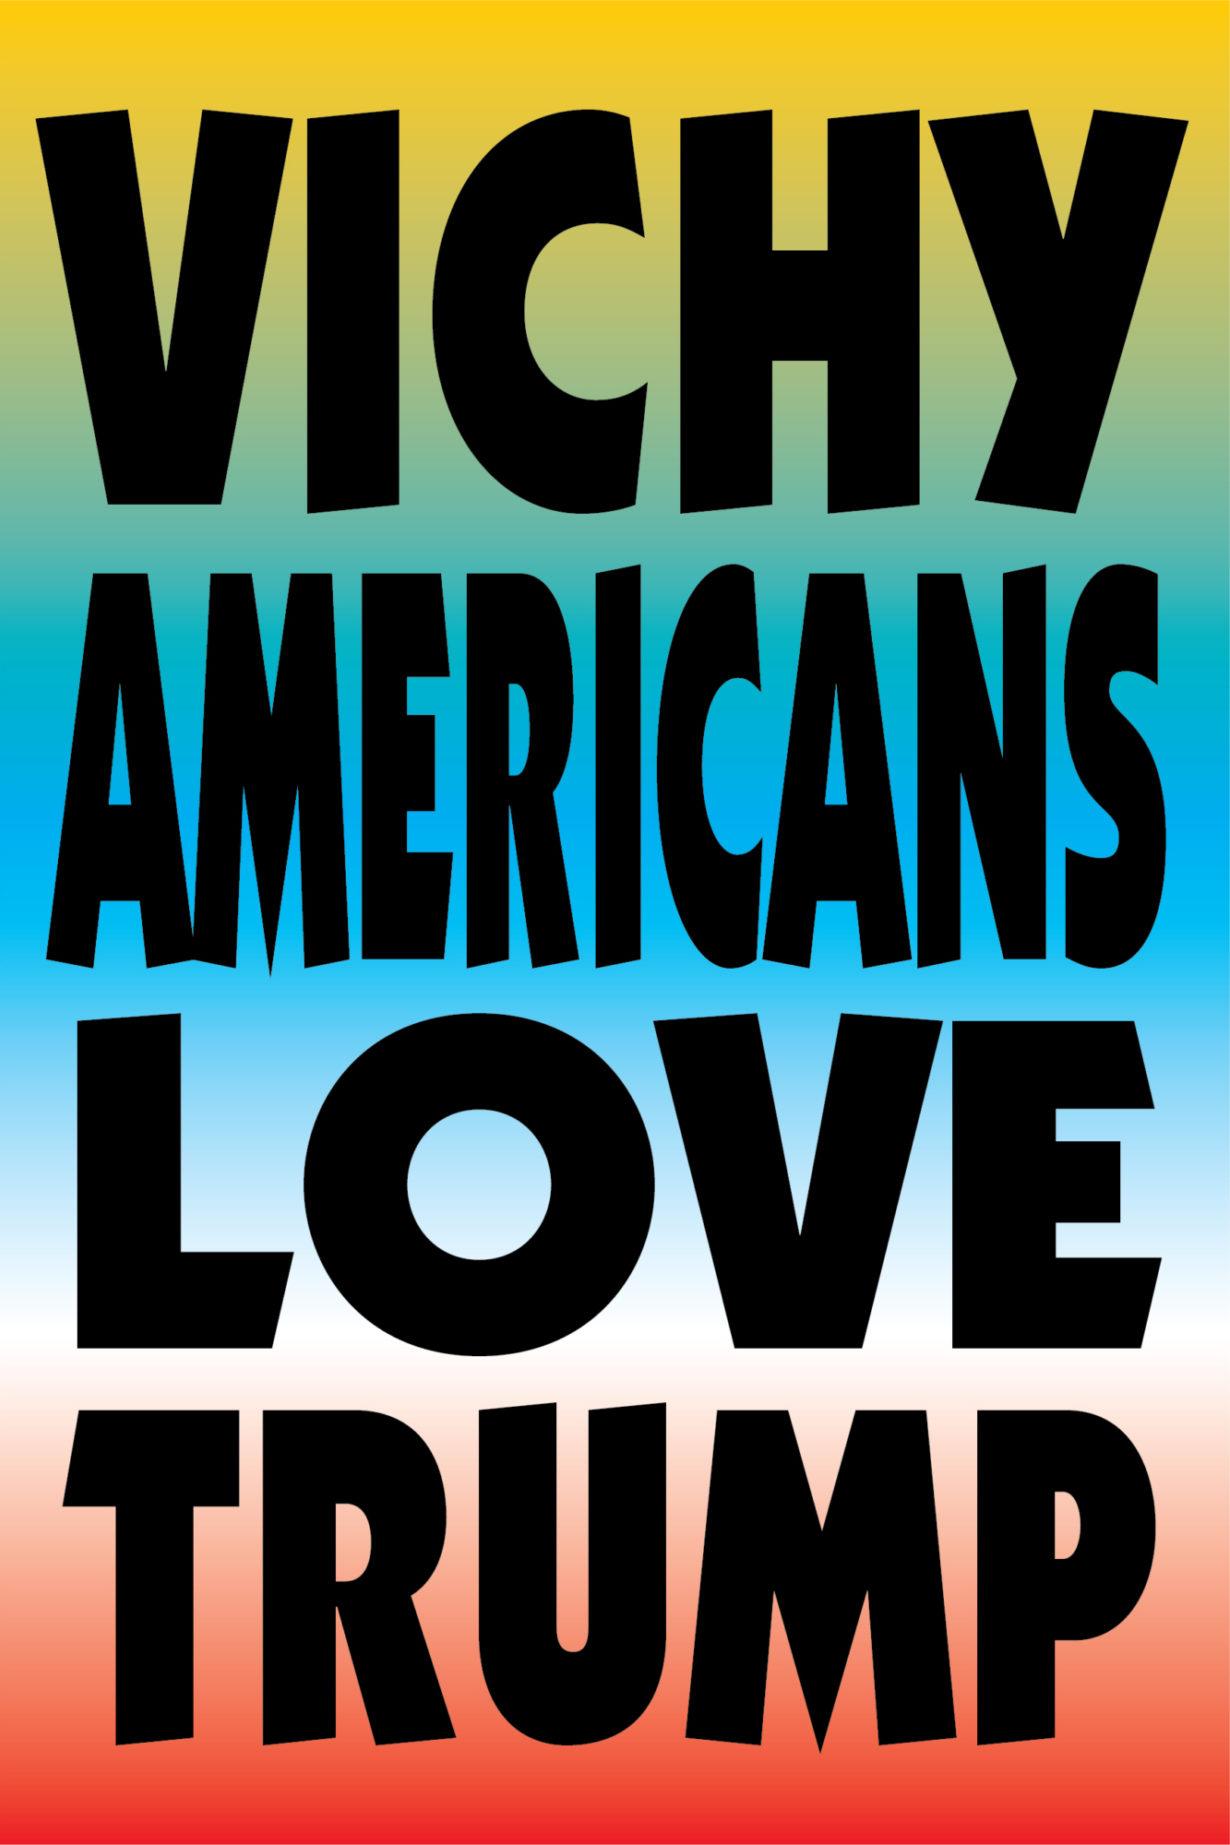 NP_76_100_2017_Vichy-Americans-Love-Trump.jpg